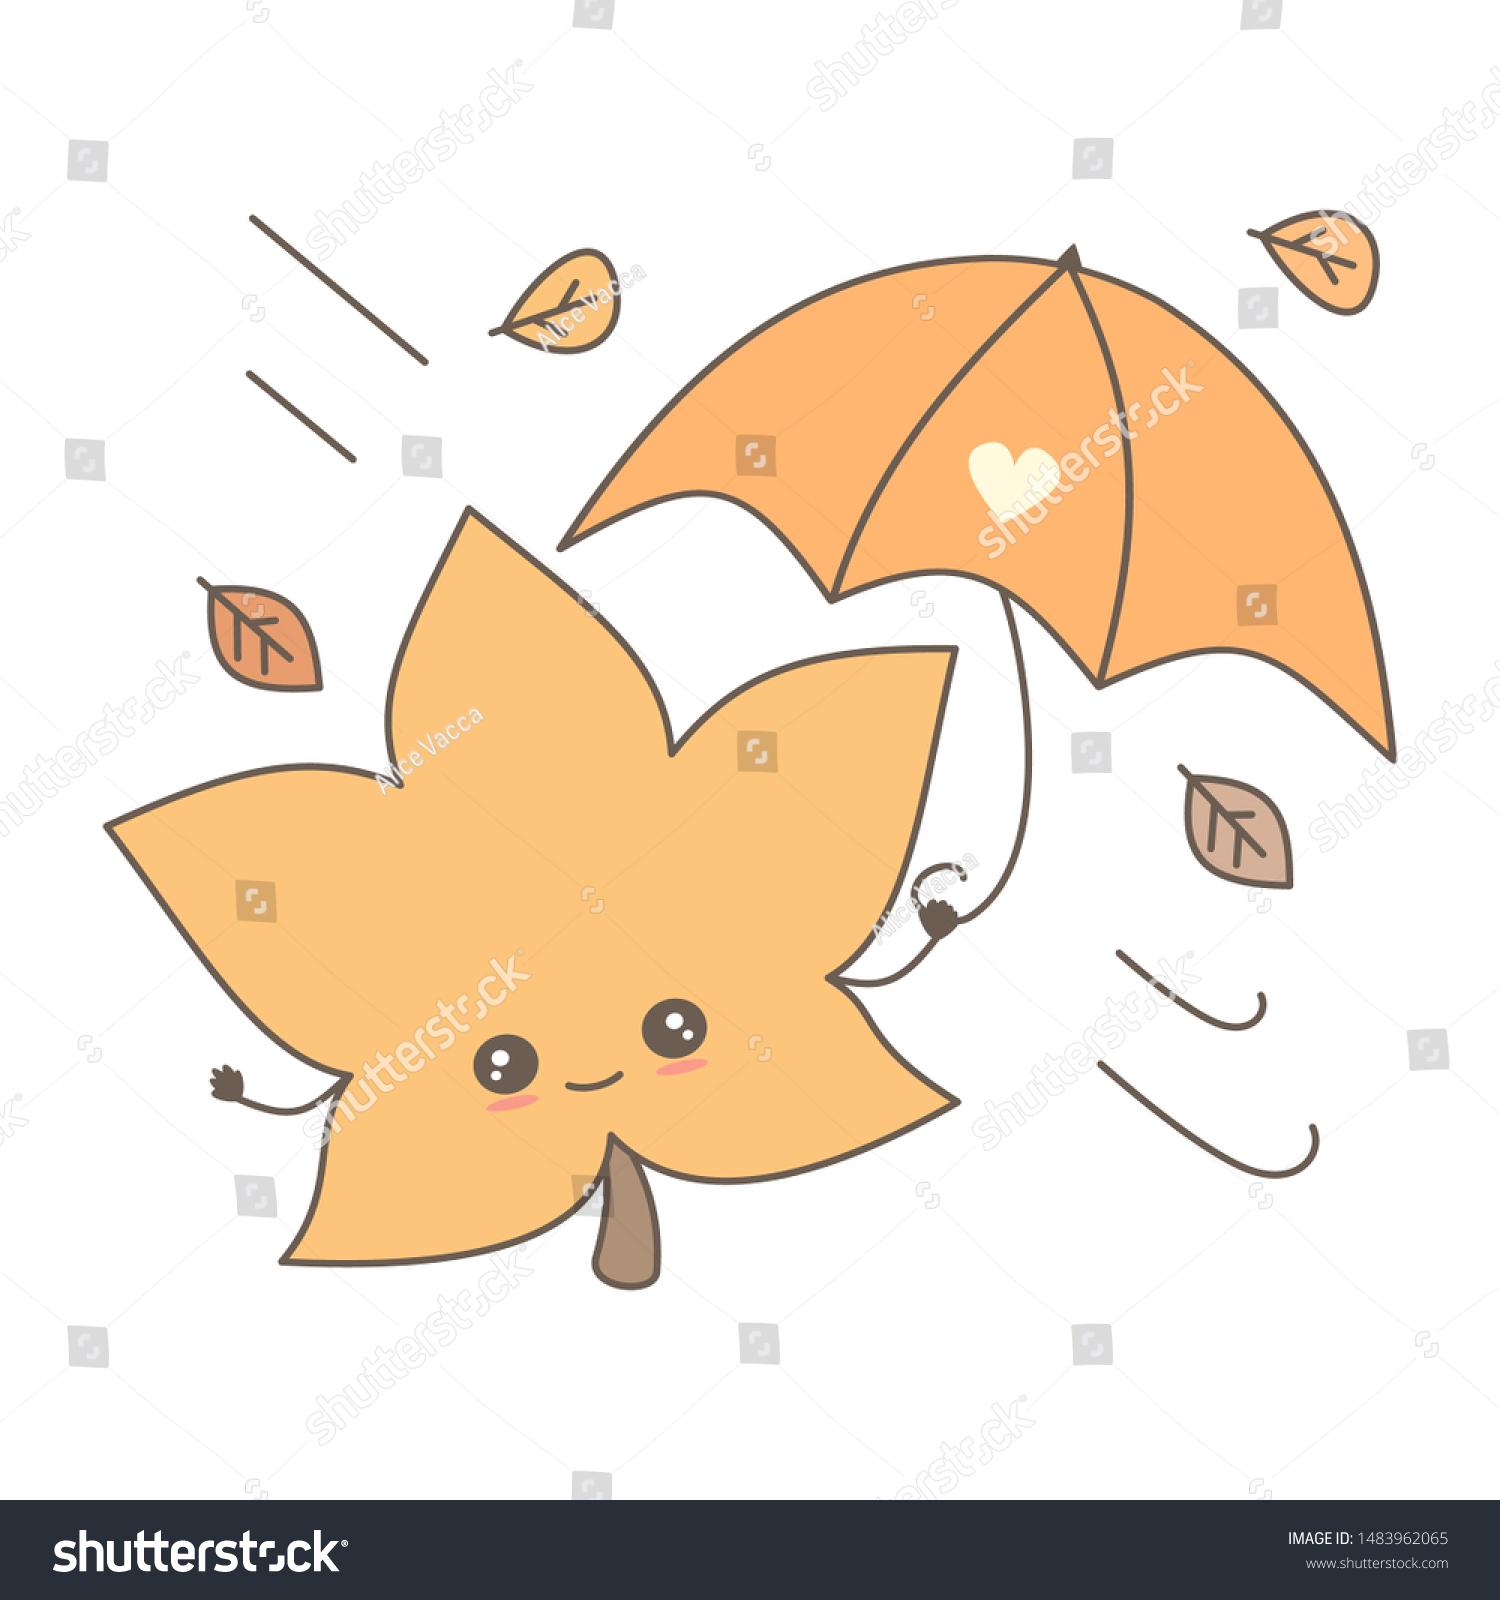 Cute Cartoon Leaf Umbrella Fall Autumn Stock Vector Royalty Free 1483962065